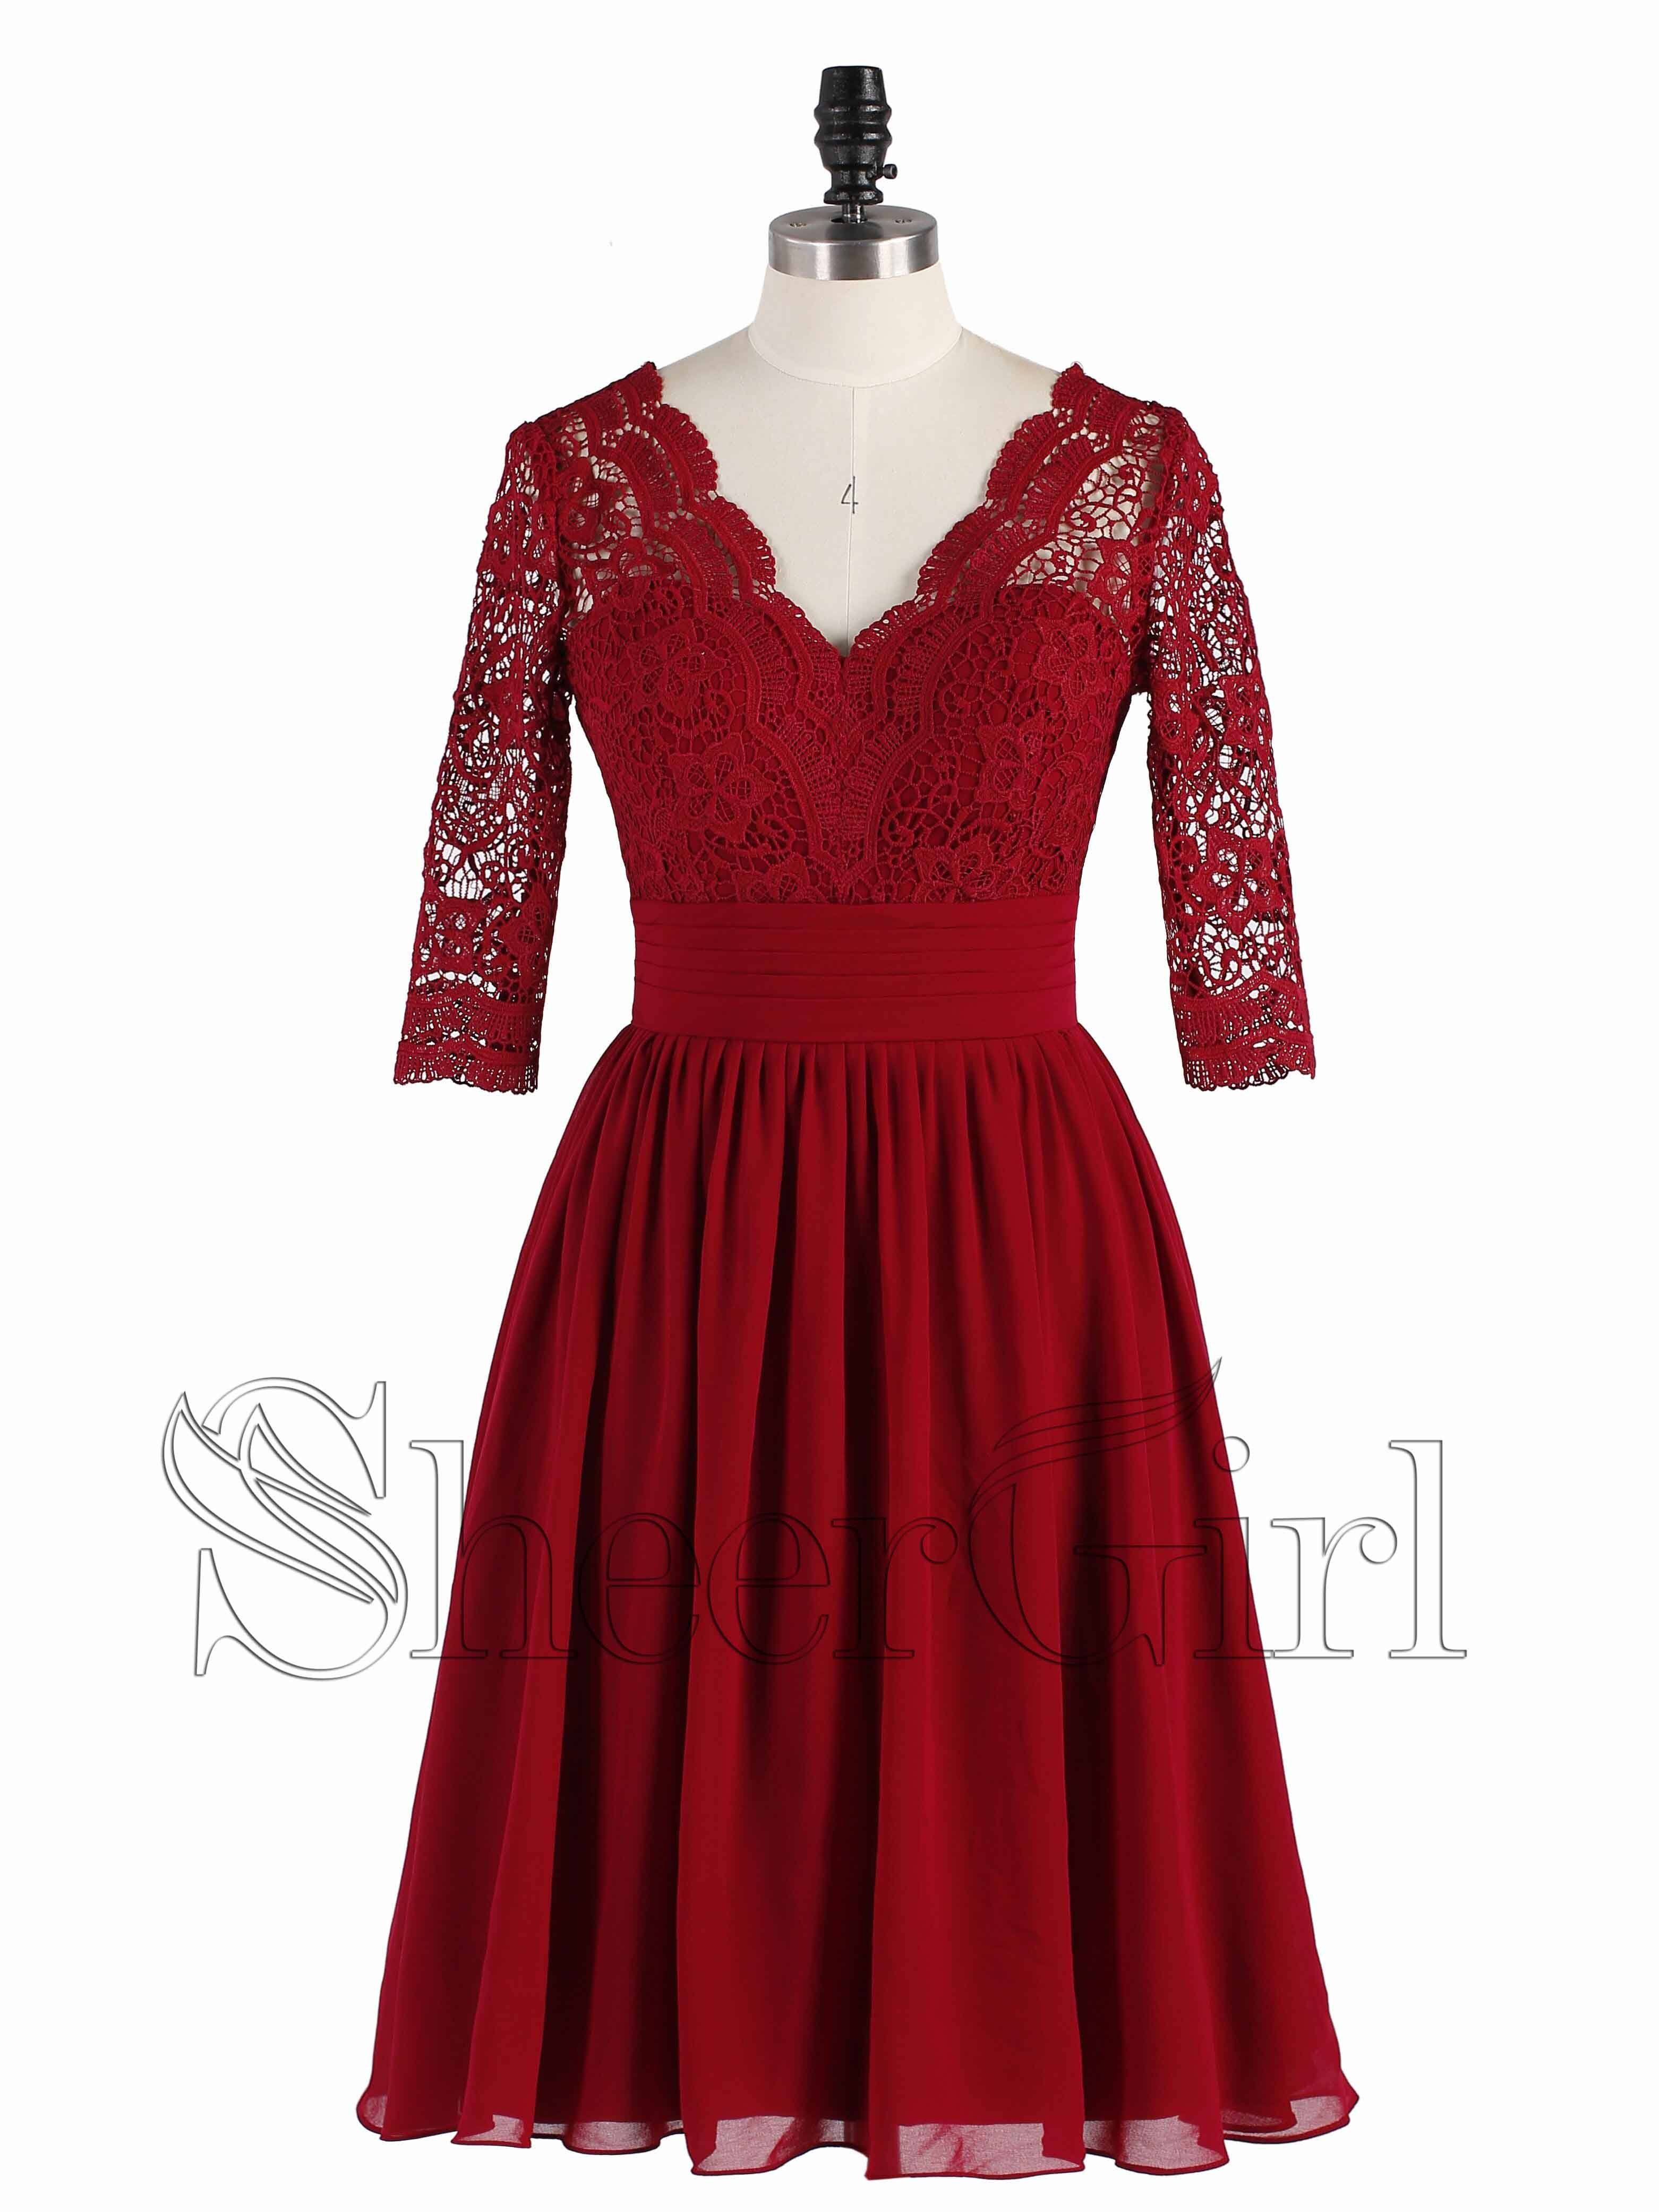 Half sleeve dark red short bridesmaid dresses lace top cheap